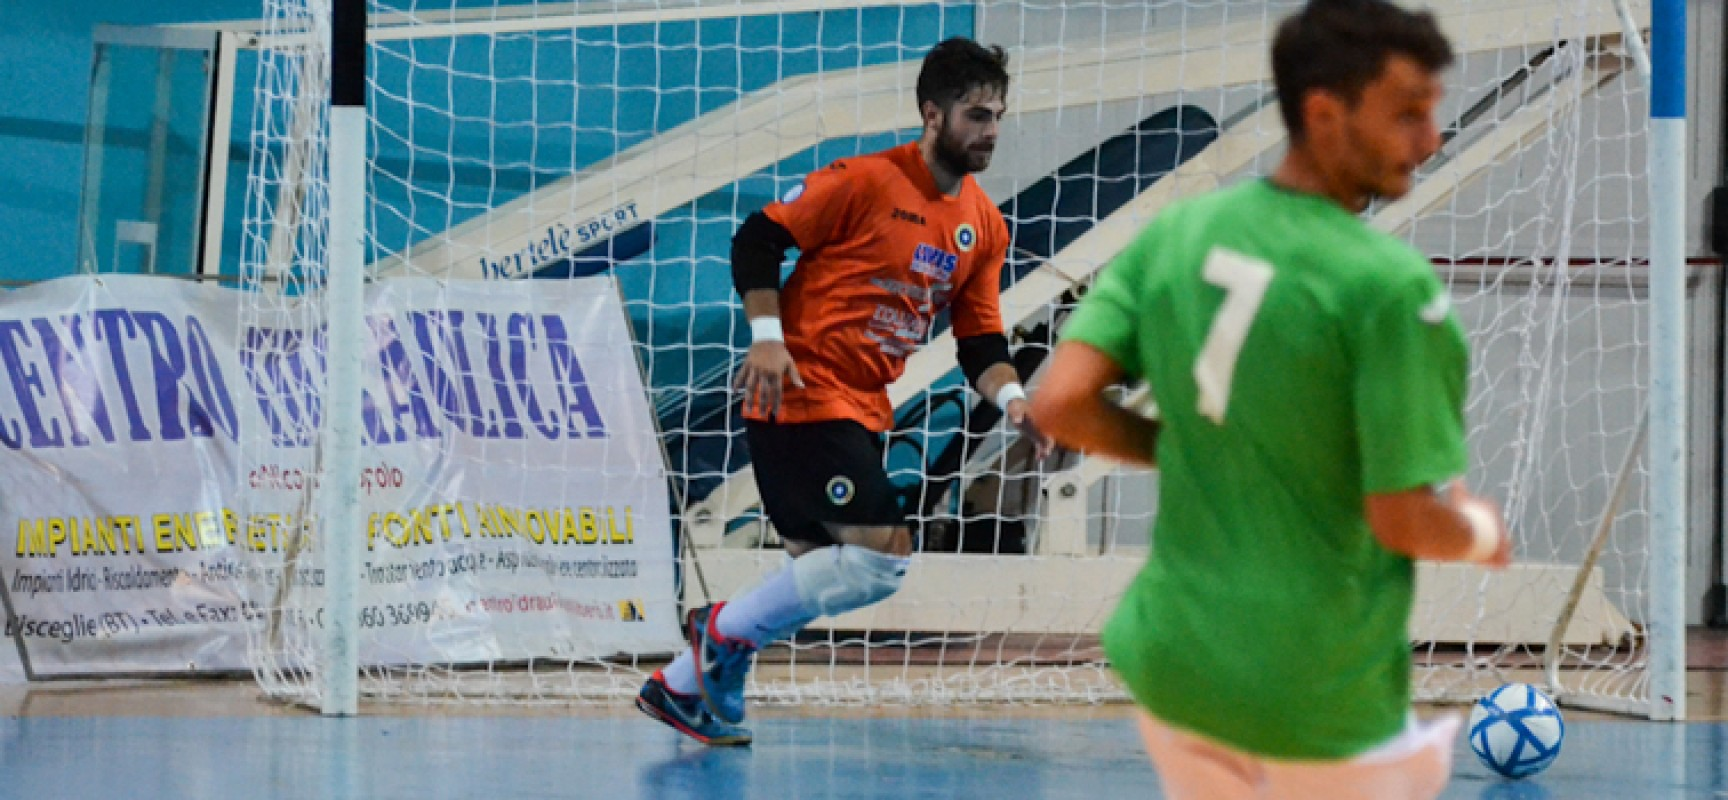 FINALE: Futsal Bisceglie – Manfredonia 4-1